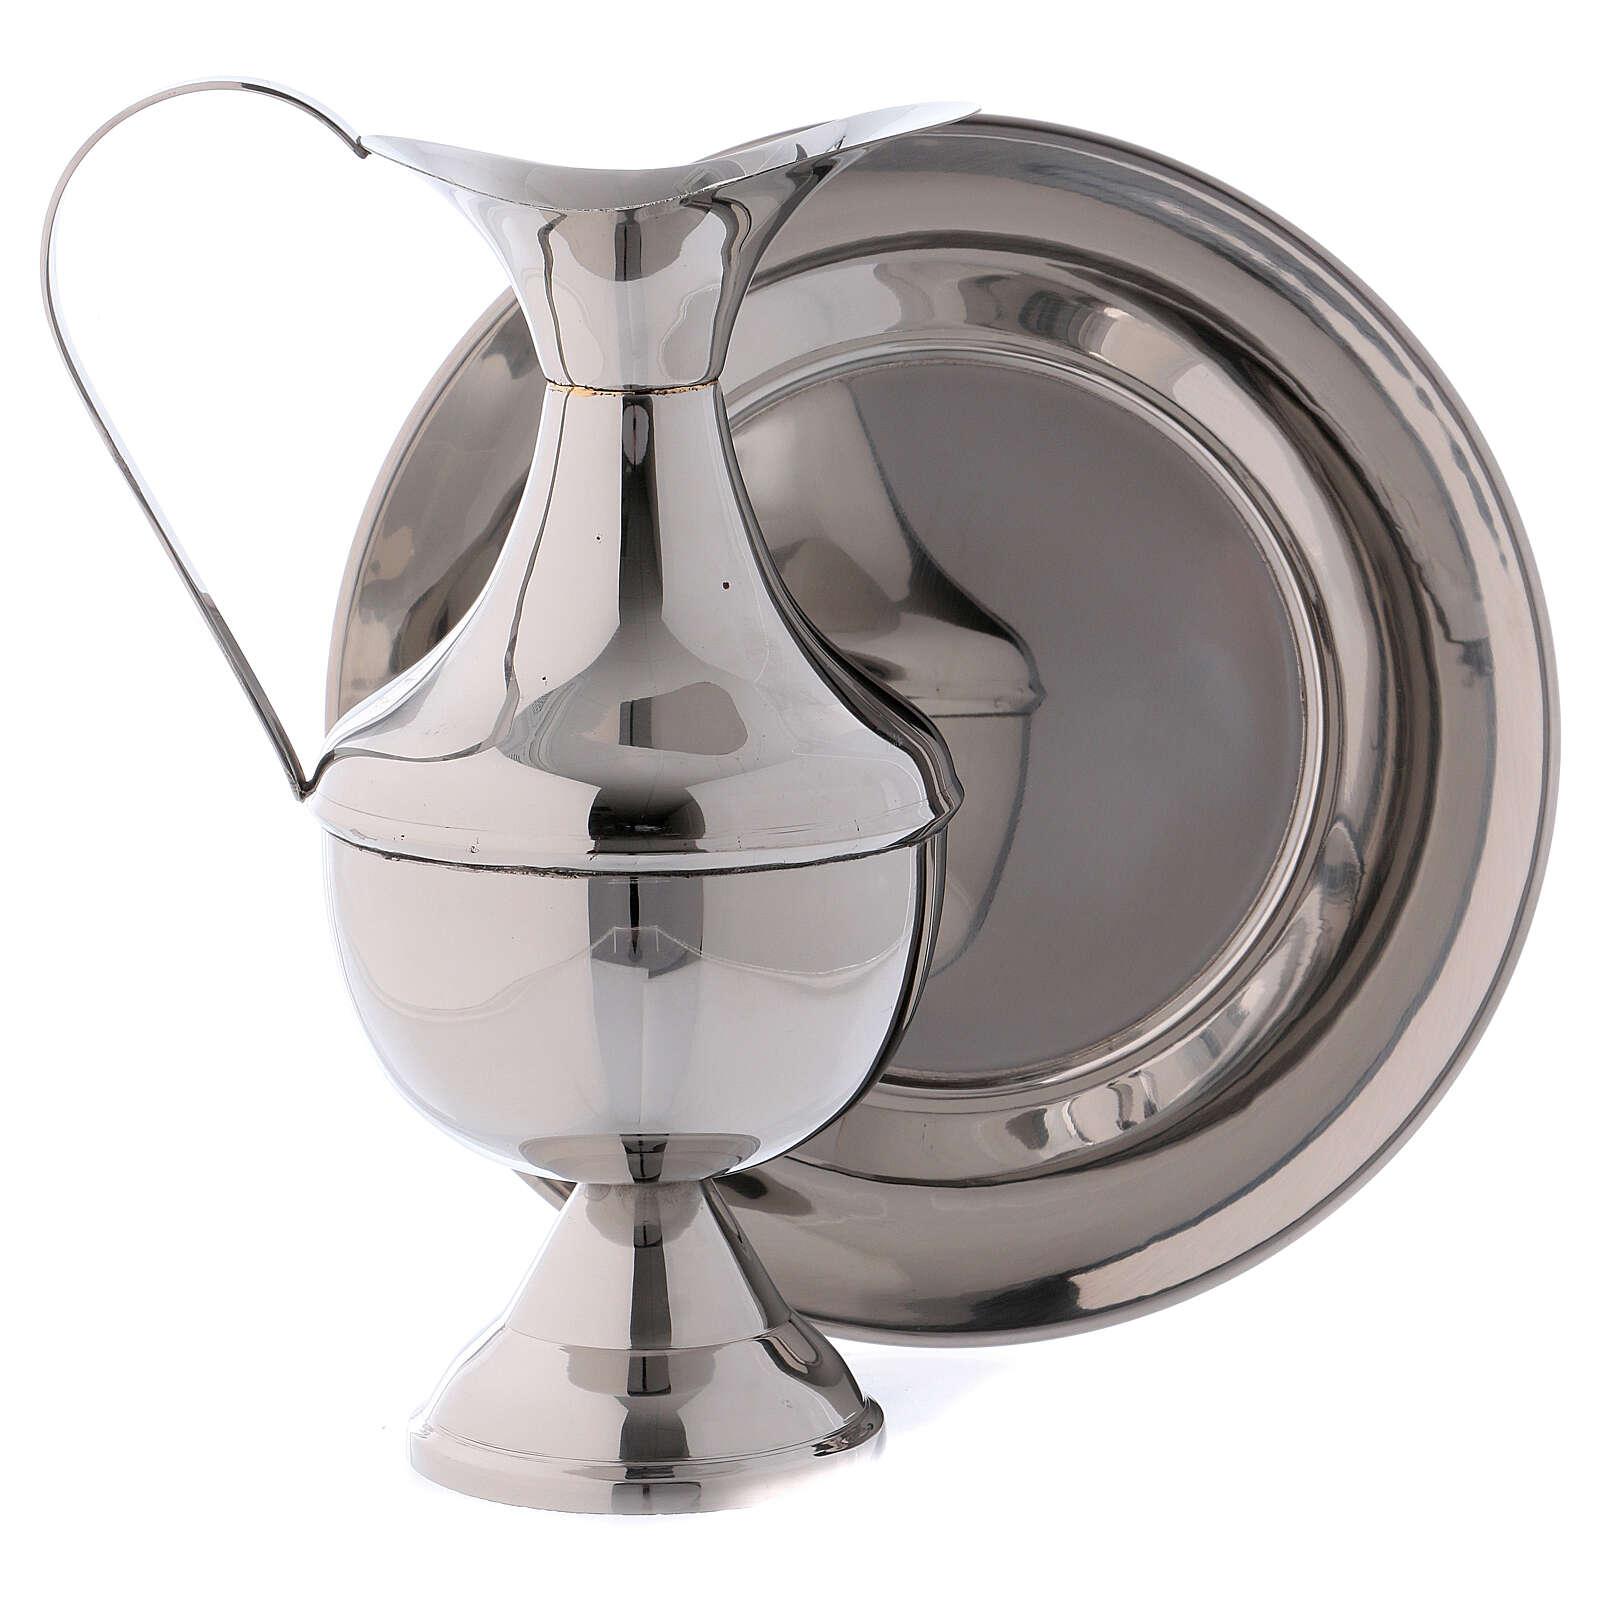 Brass ewer with basin for hand washing ritual 3